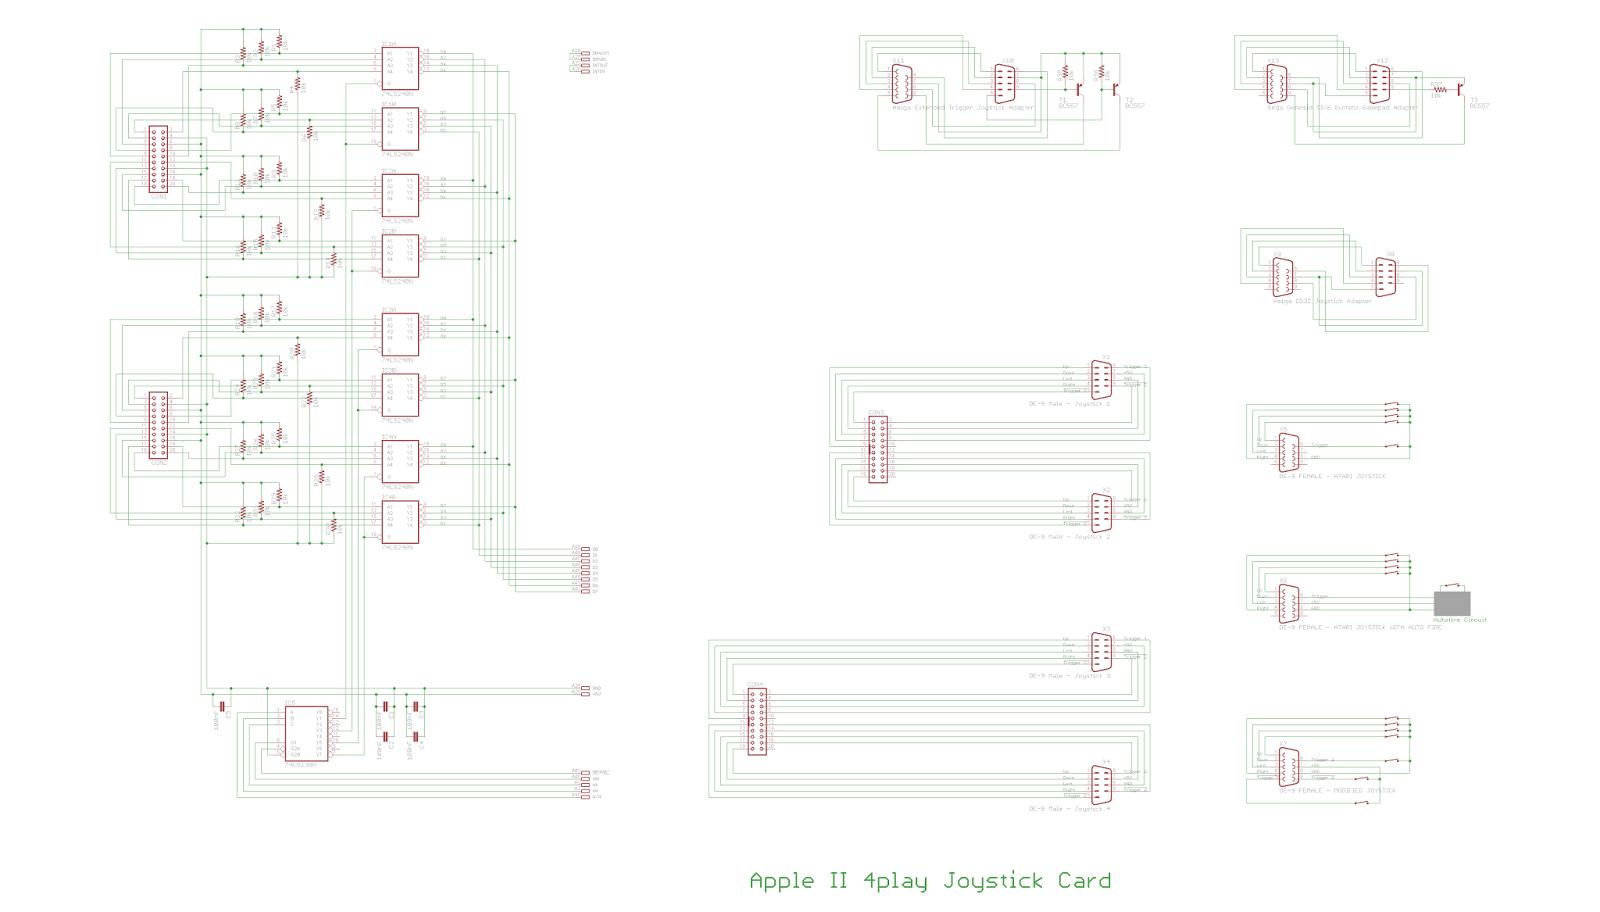 Apple II Projects: Apple II 4play Joystick Card